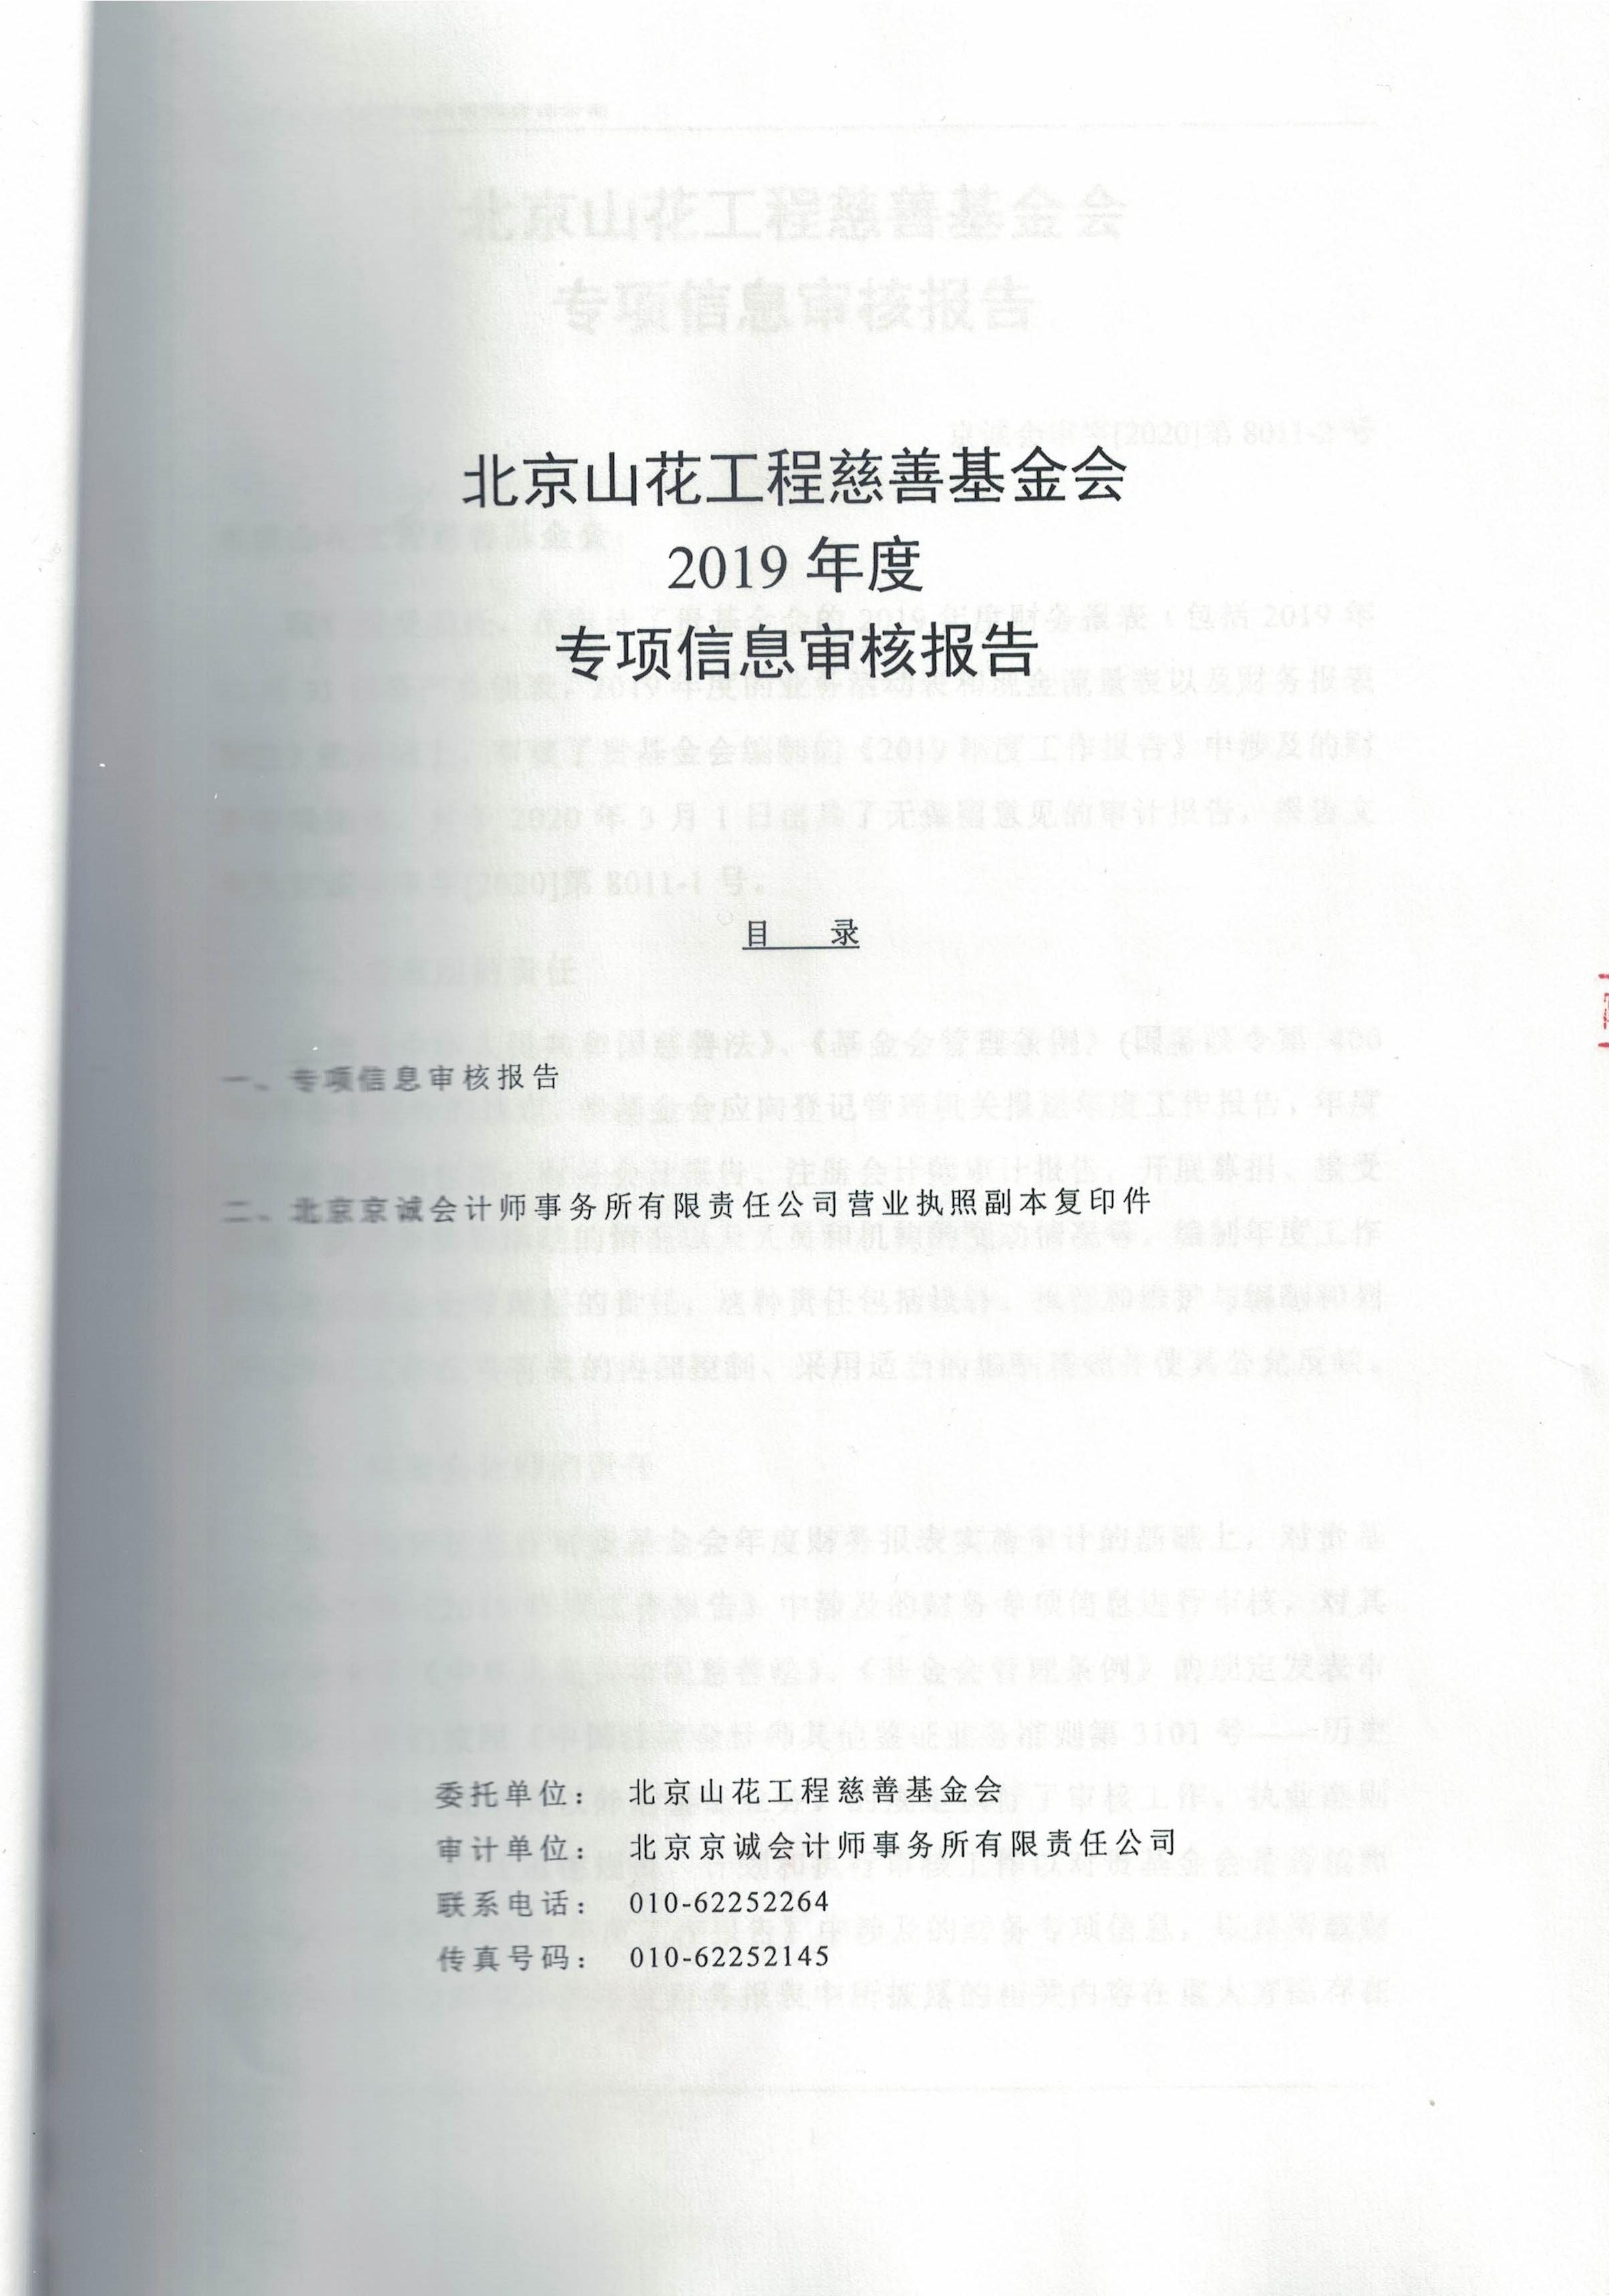 CCF20210114_0001_页面_19